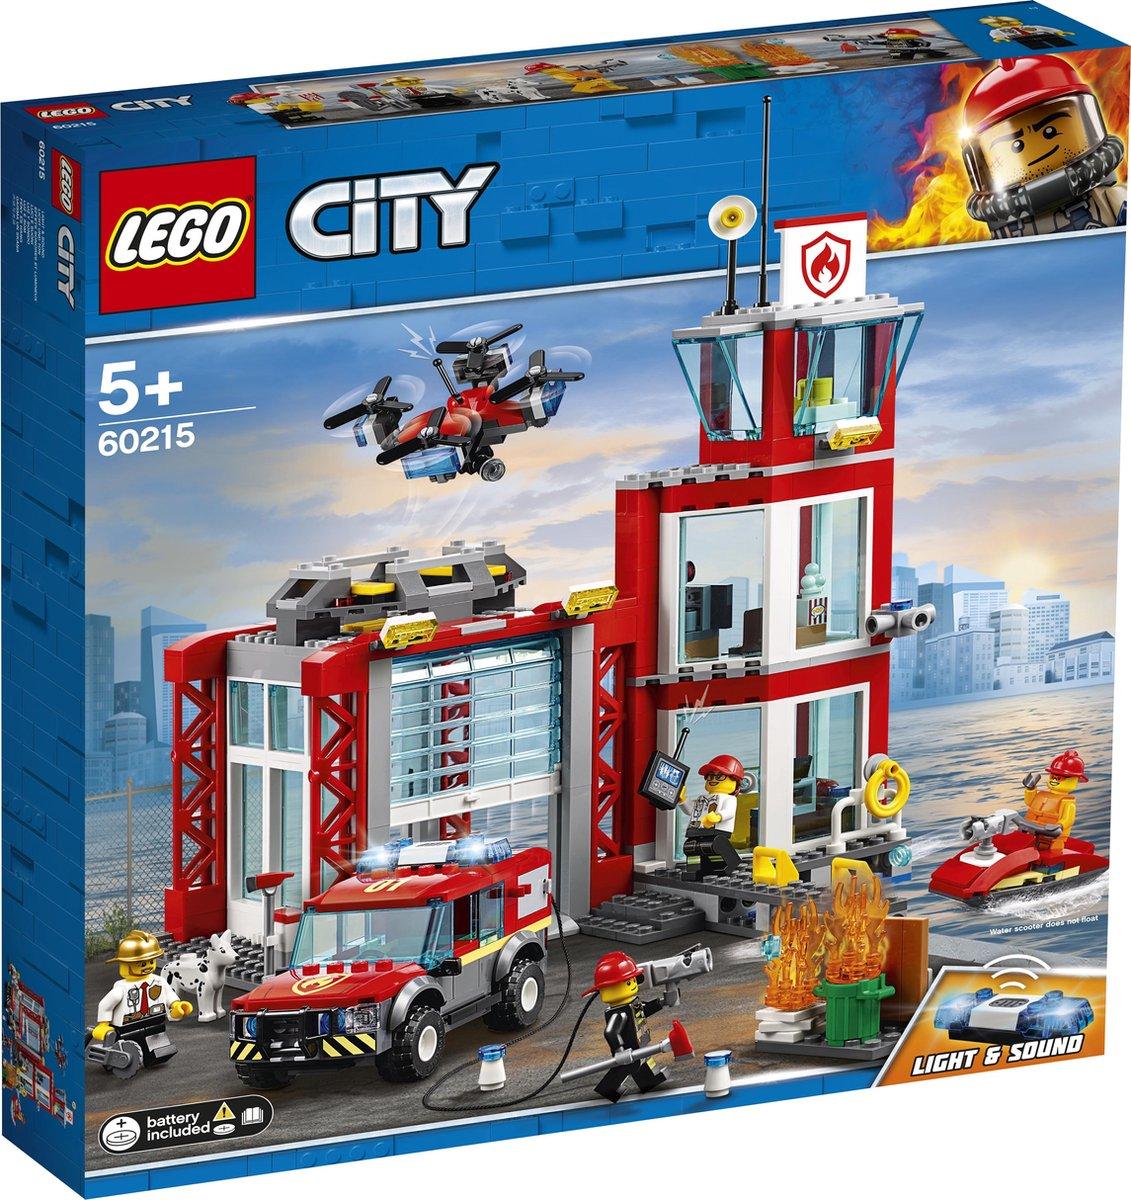 LEGO City Brandweerkazerne - 60215